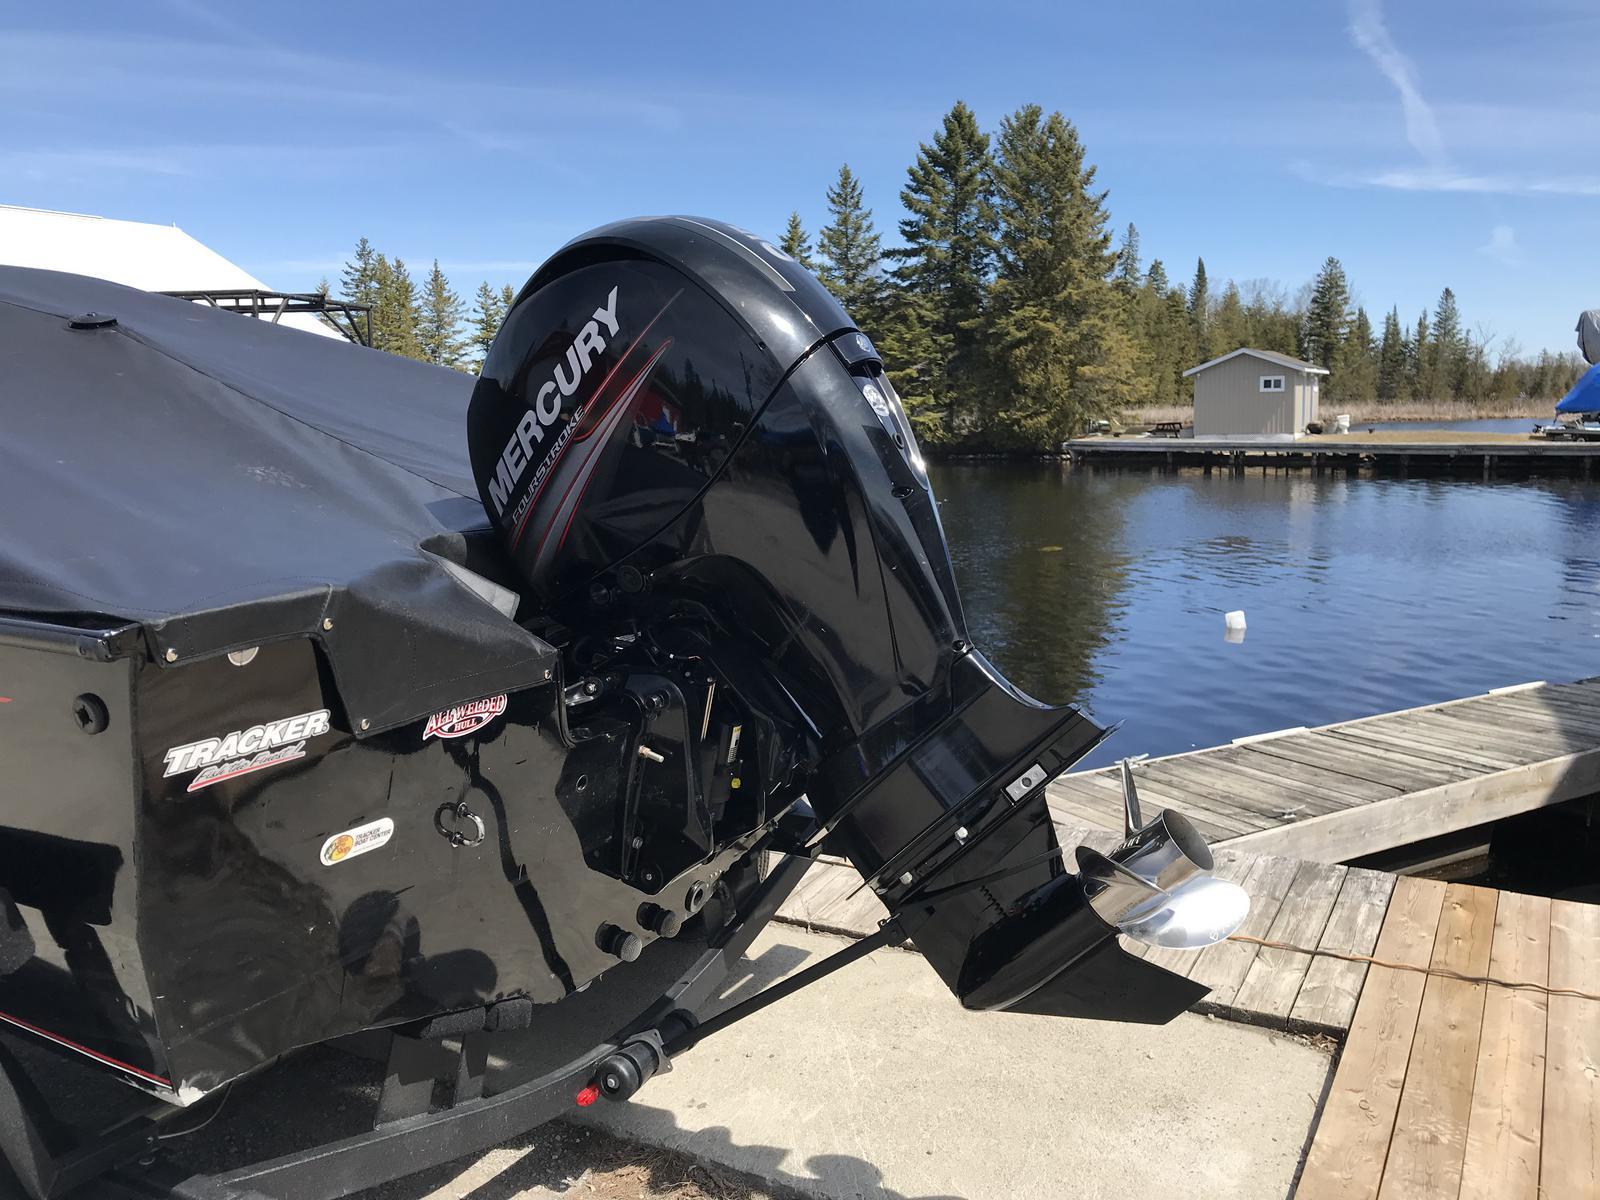 2018 Tracker Targa V18 for sale in Bobcaygeon, ON  Birch